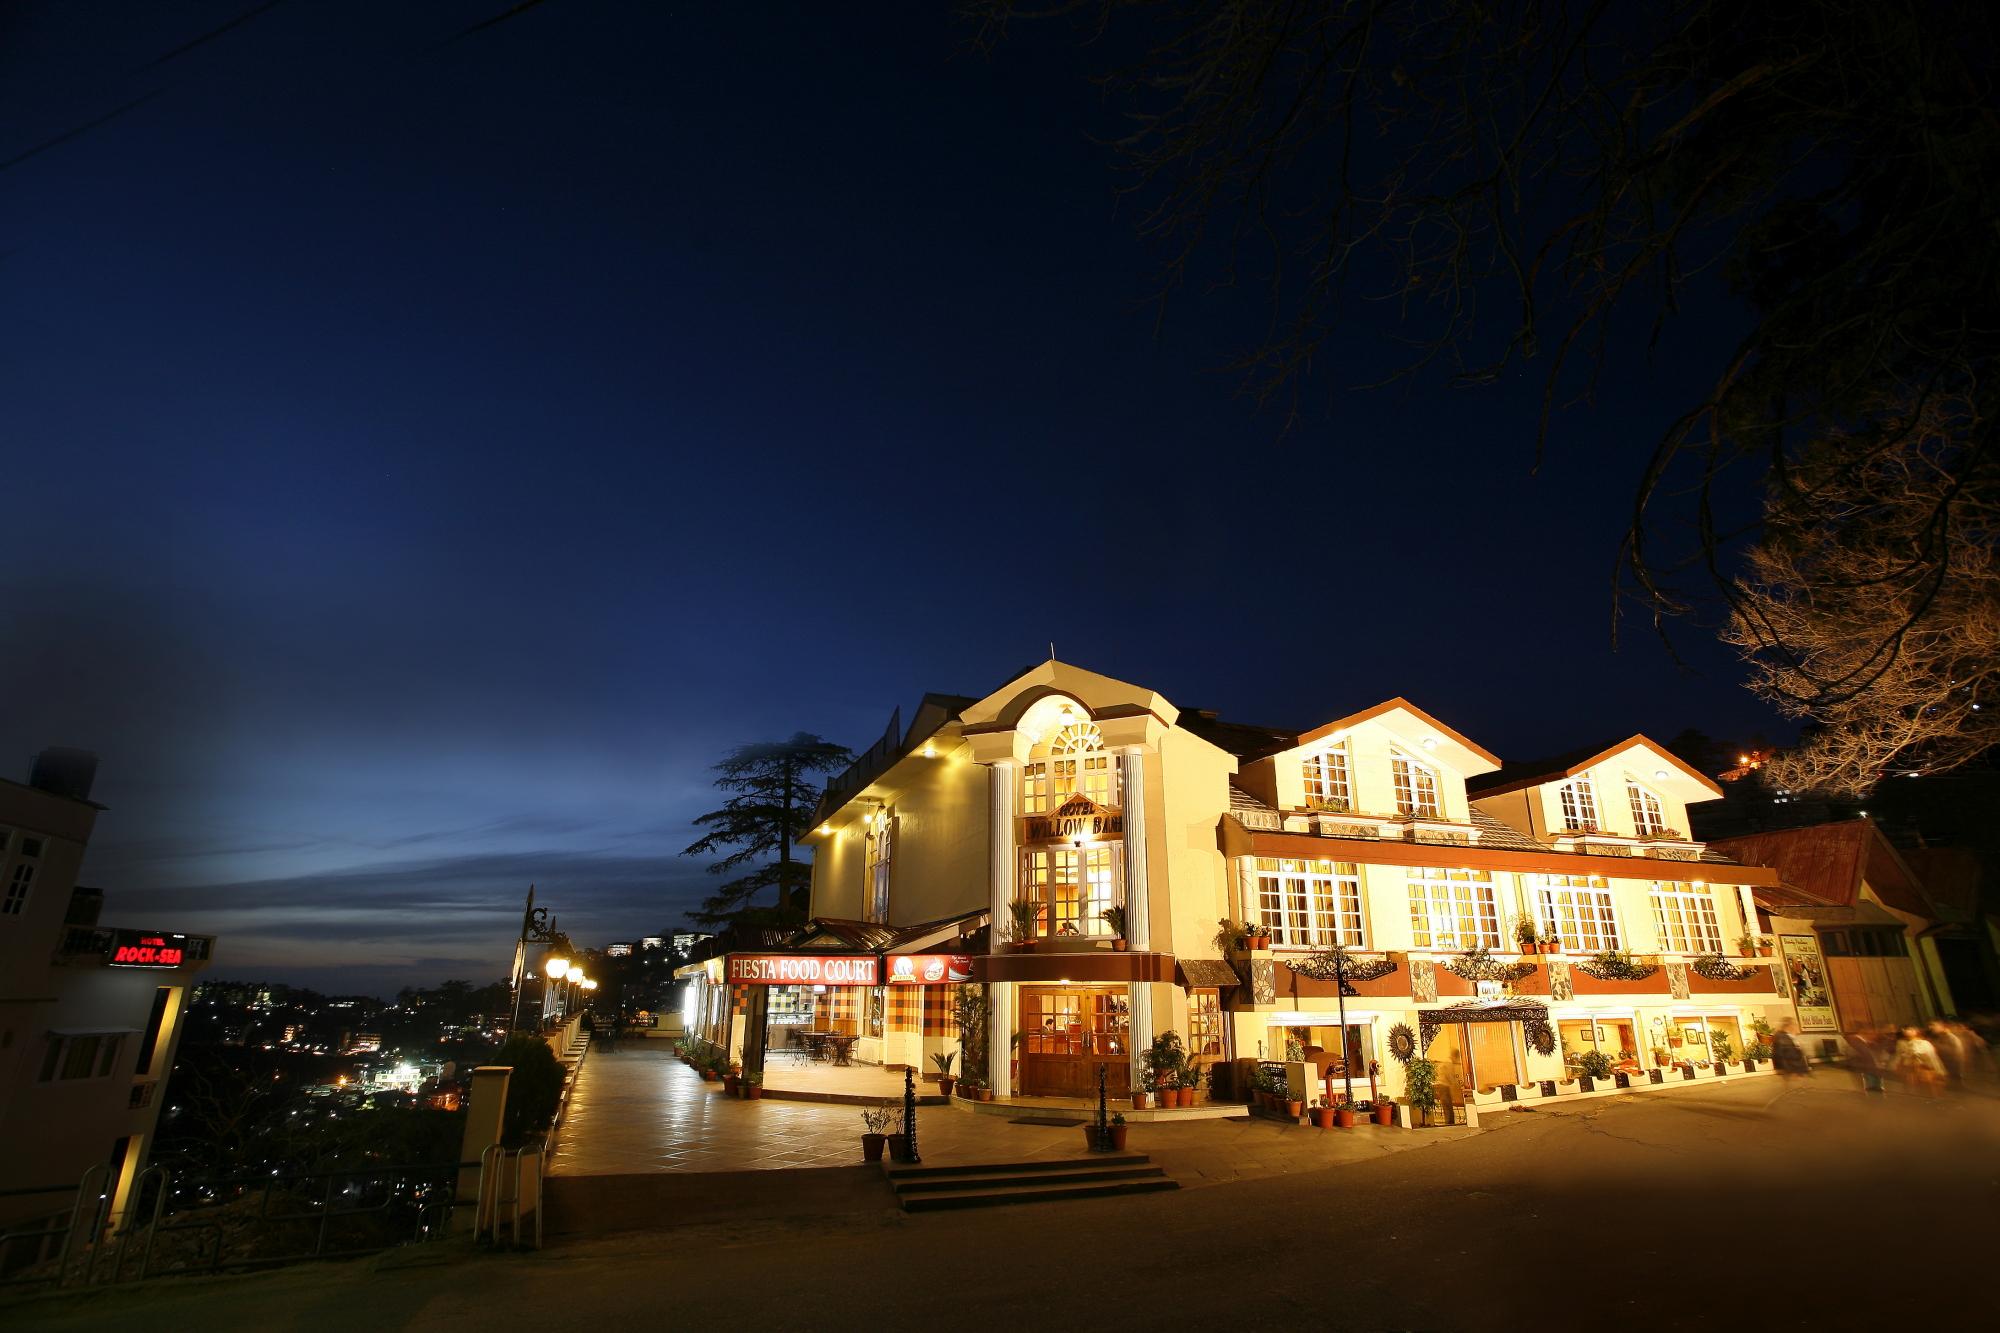 hotel willow banks shimla_10618net wix